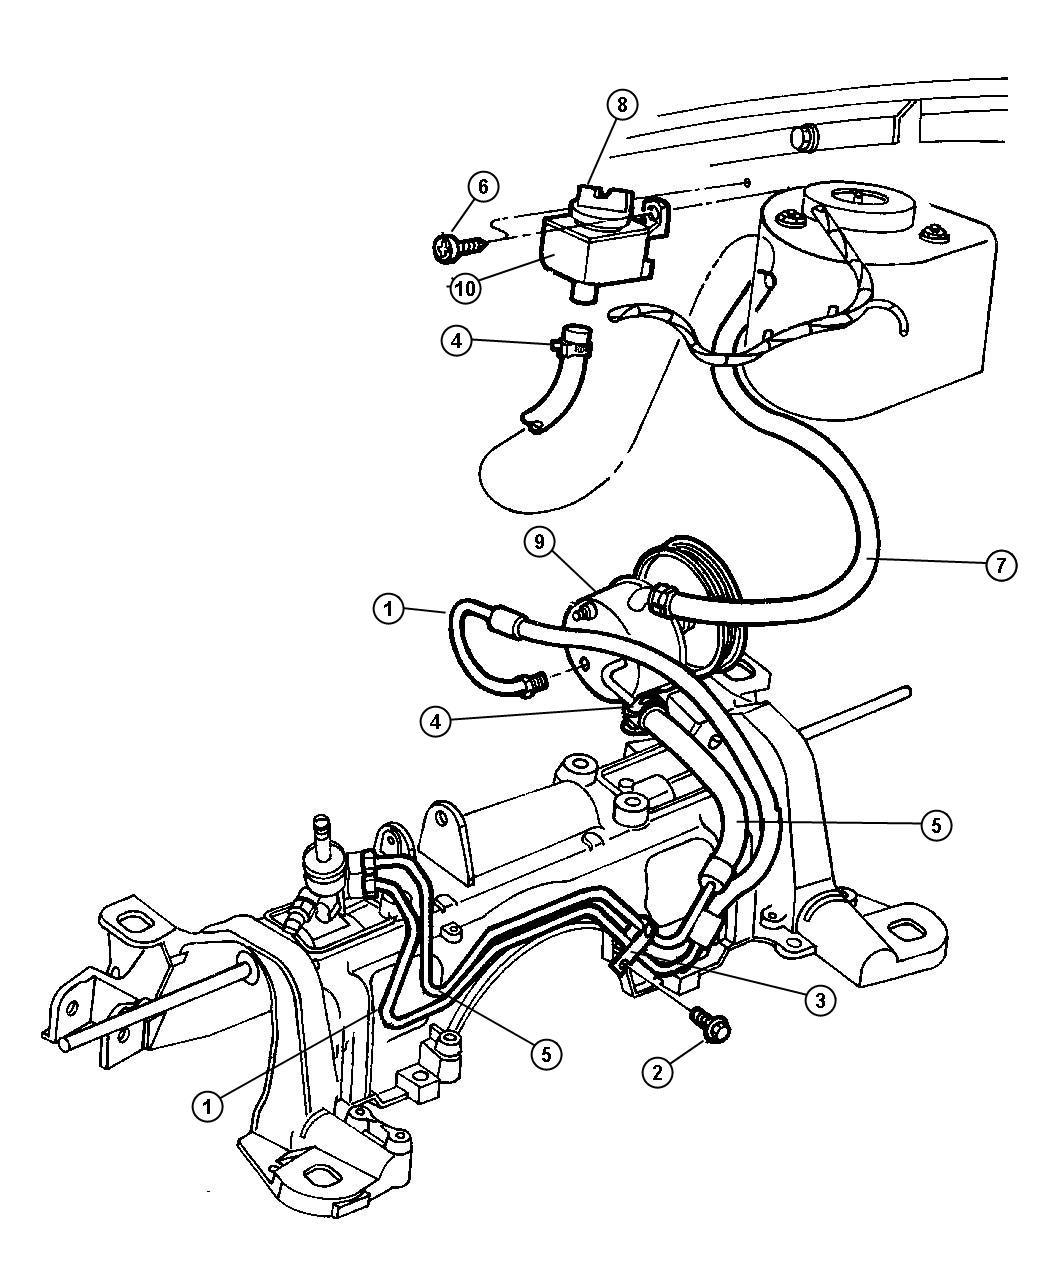 Dodge Grand Caravan Hose  Power Steering  Engine  Pinion  Rack